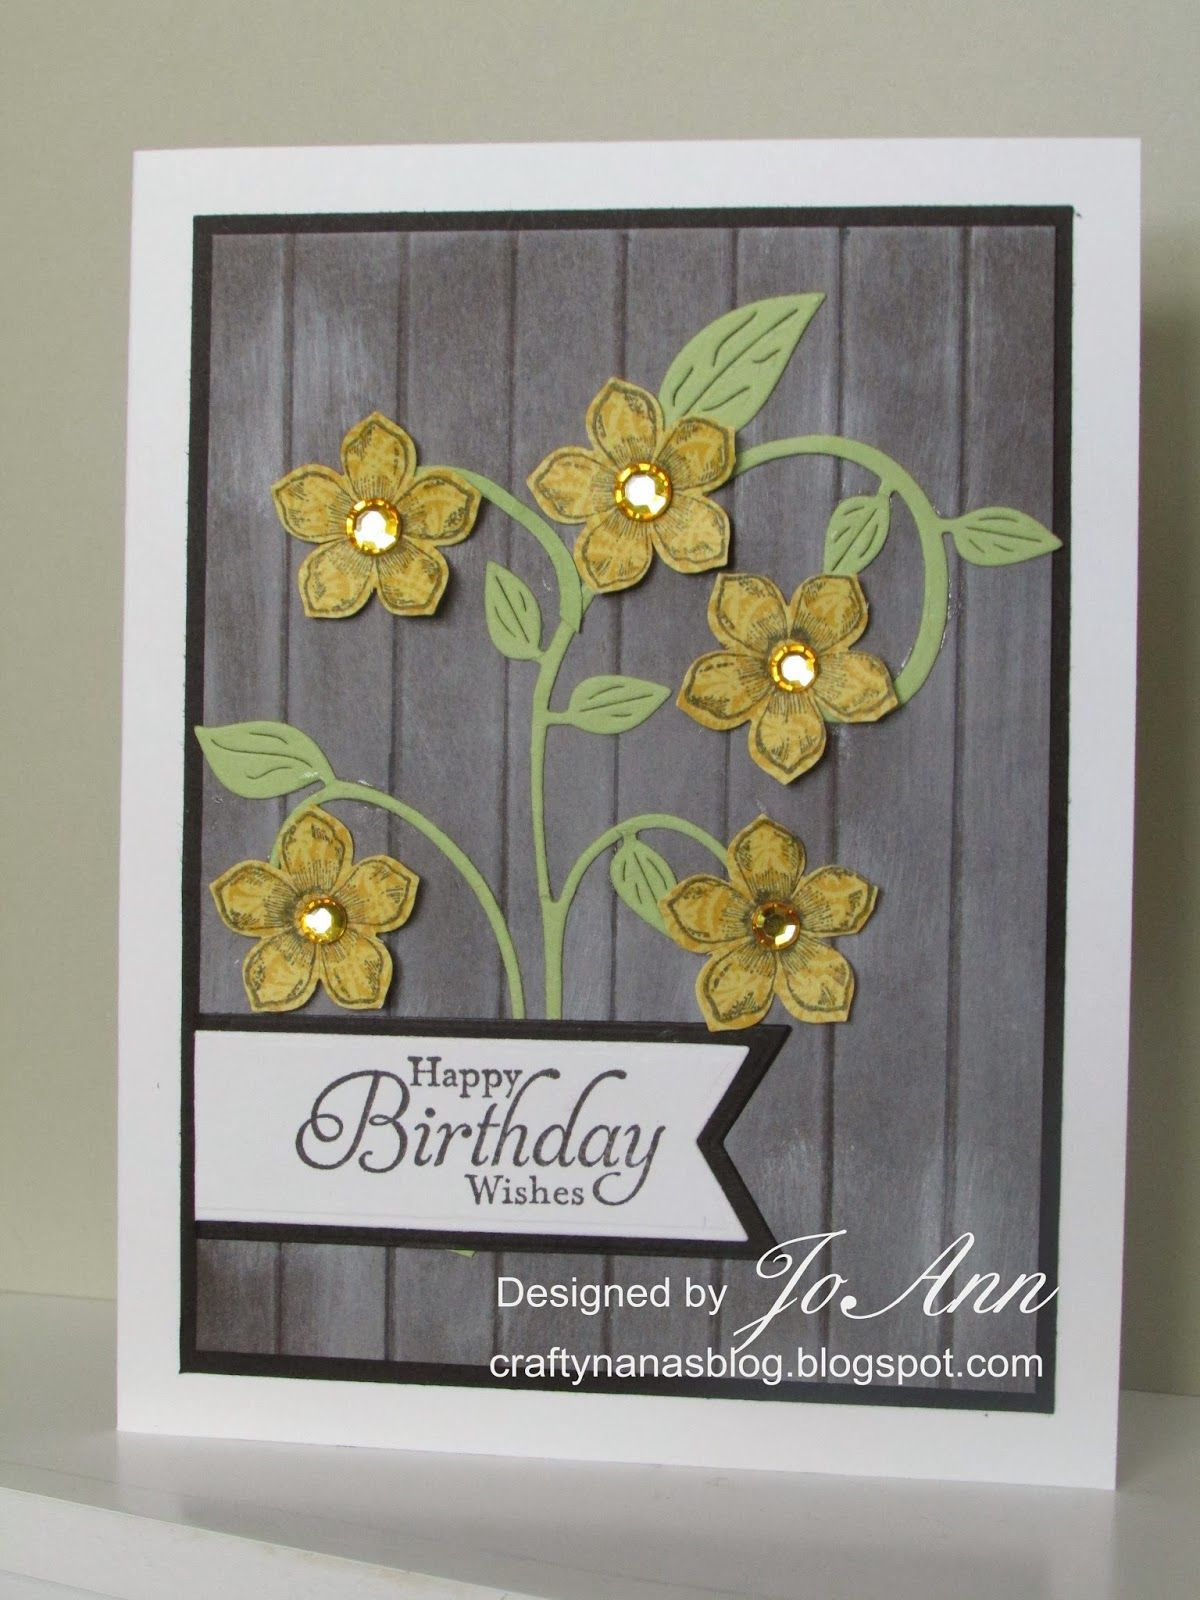 Crafty nanaus blog happy birthday wishes for jugs petite